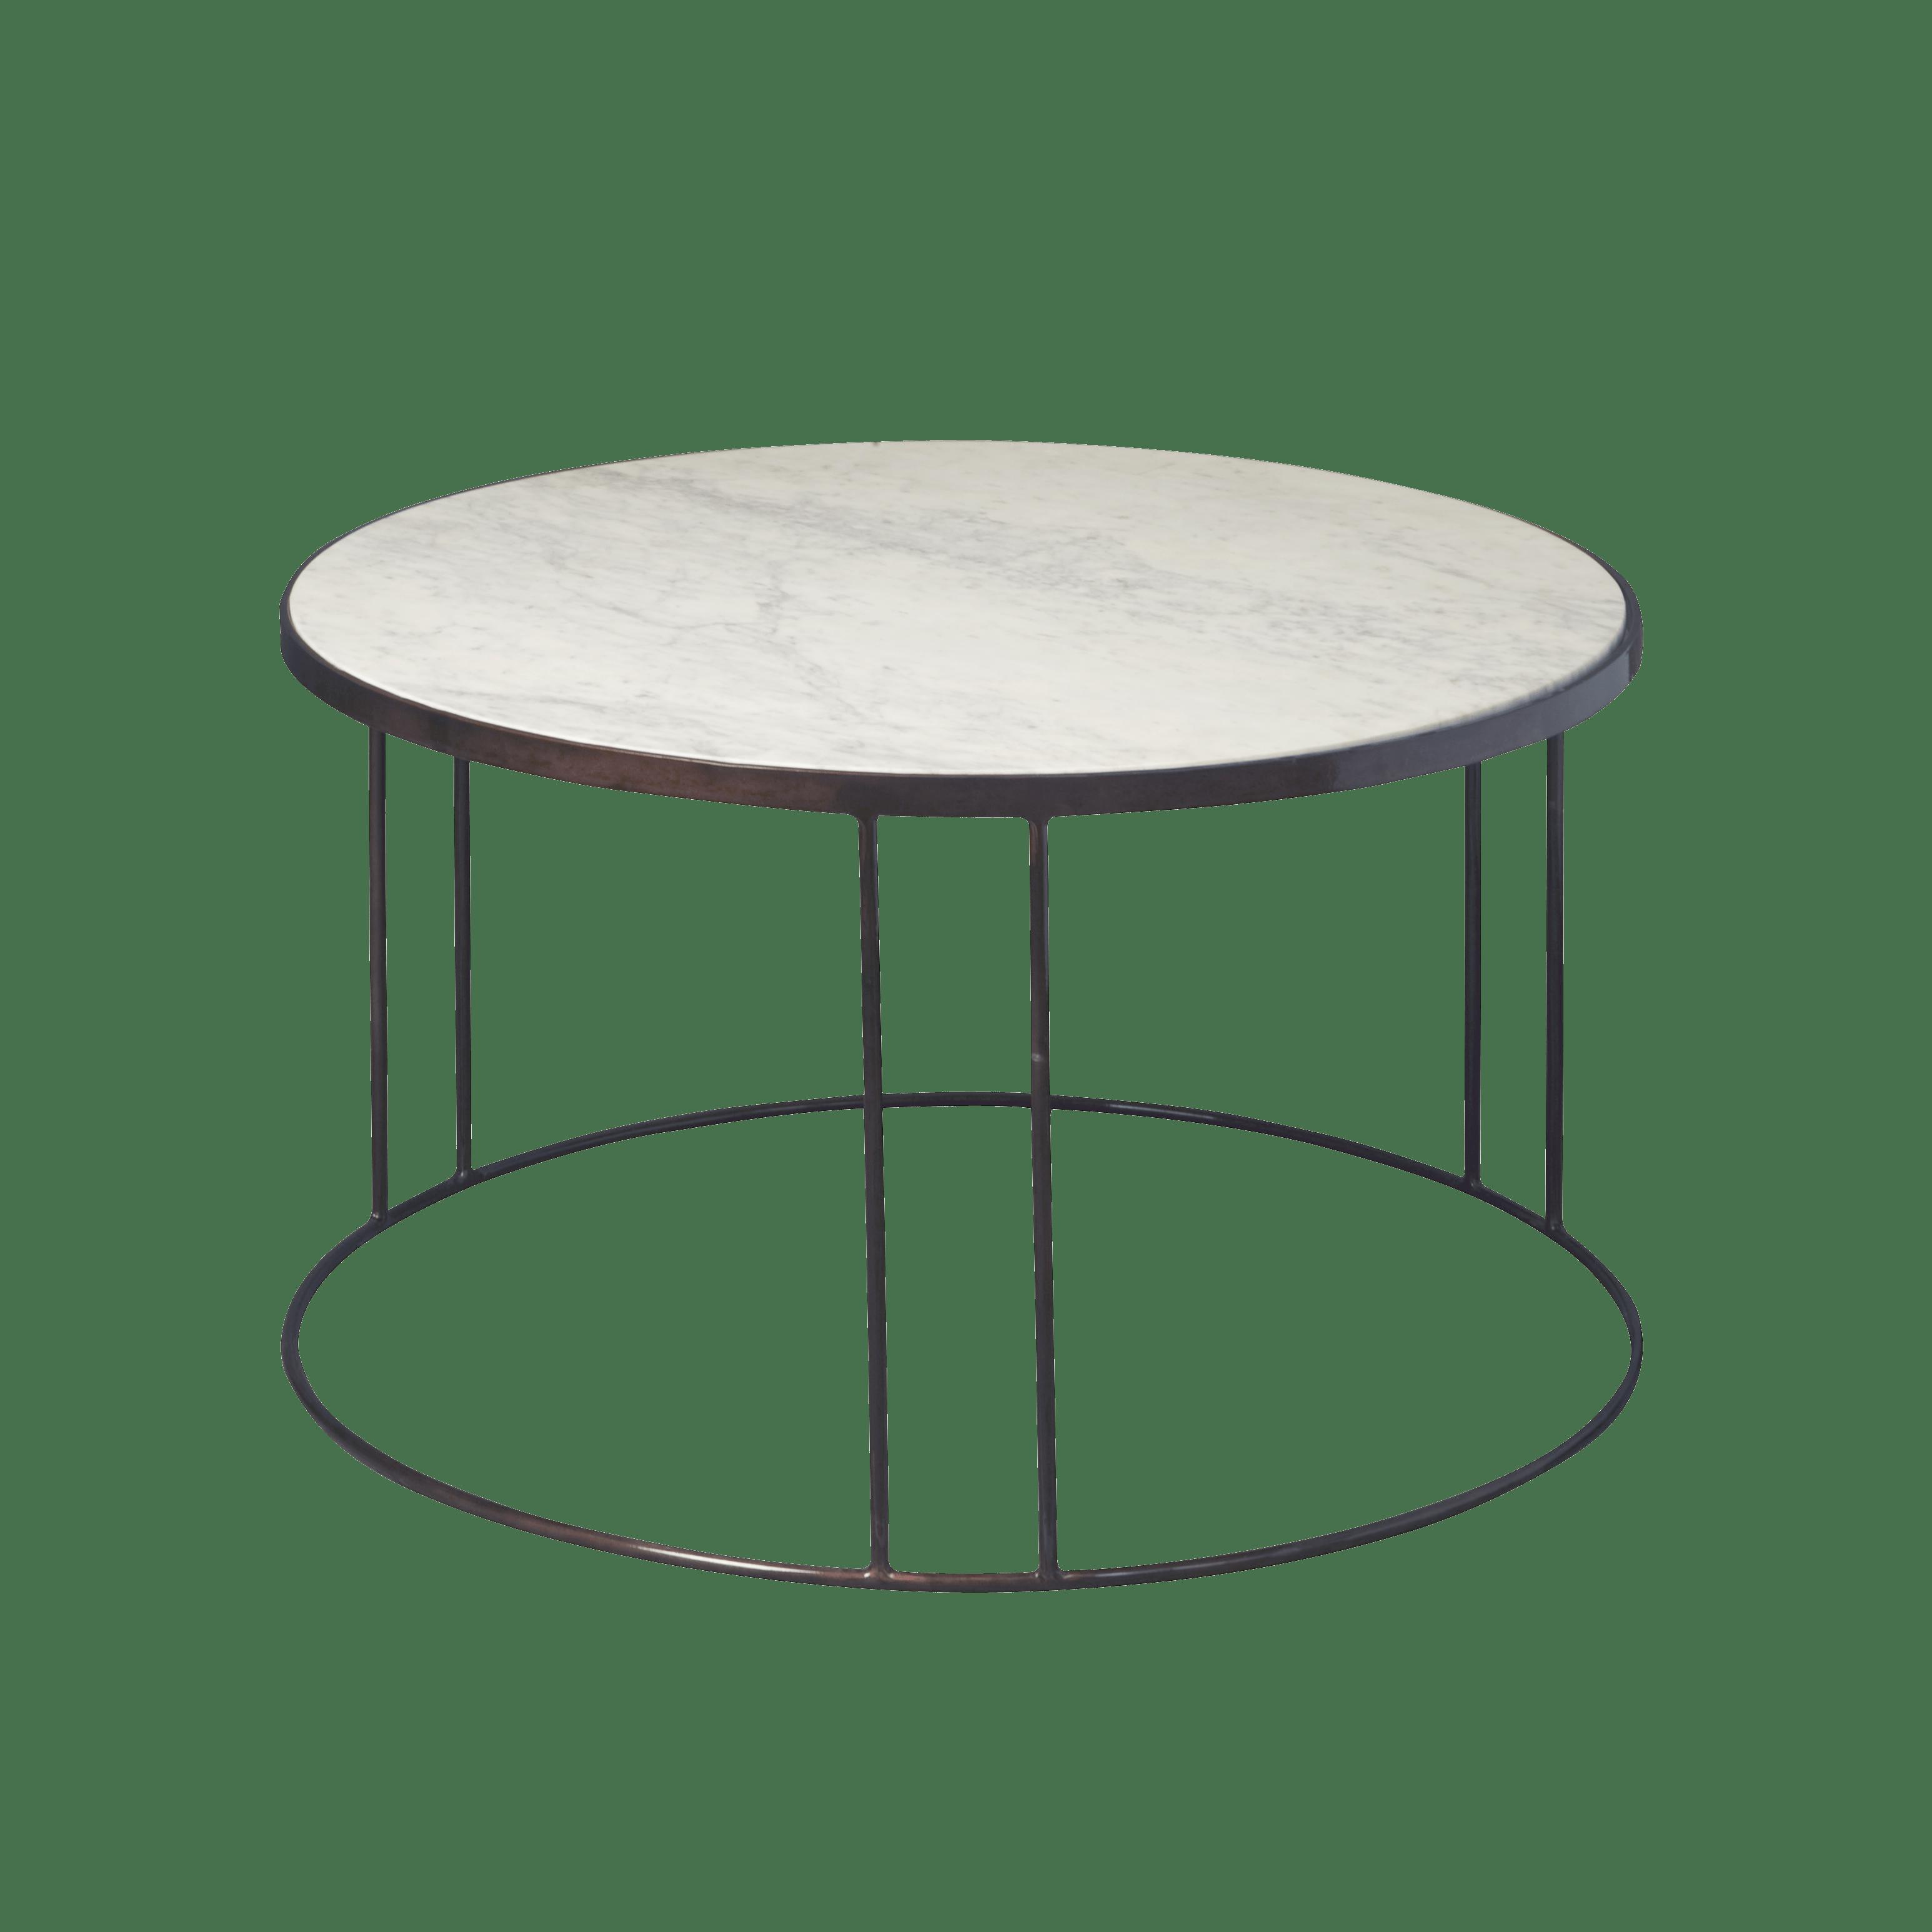 Tafel - Salontafels - Iron coffee round table w marble top 81x81x48